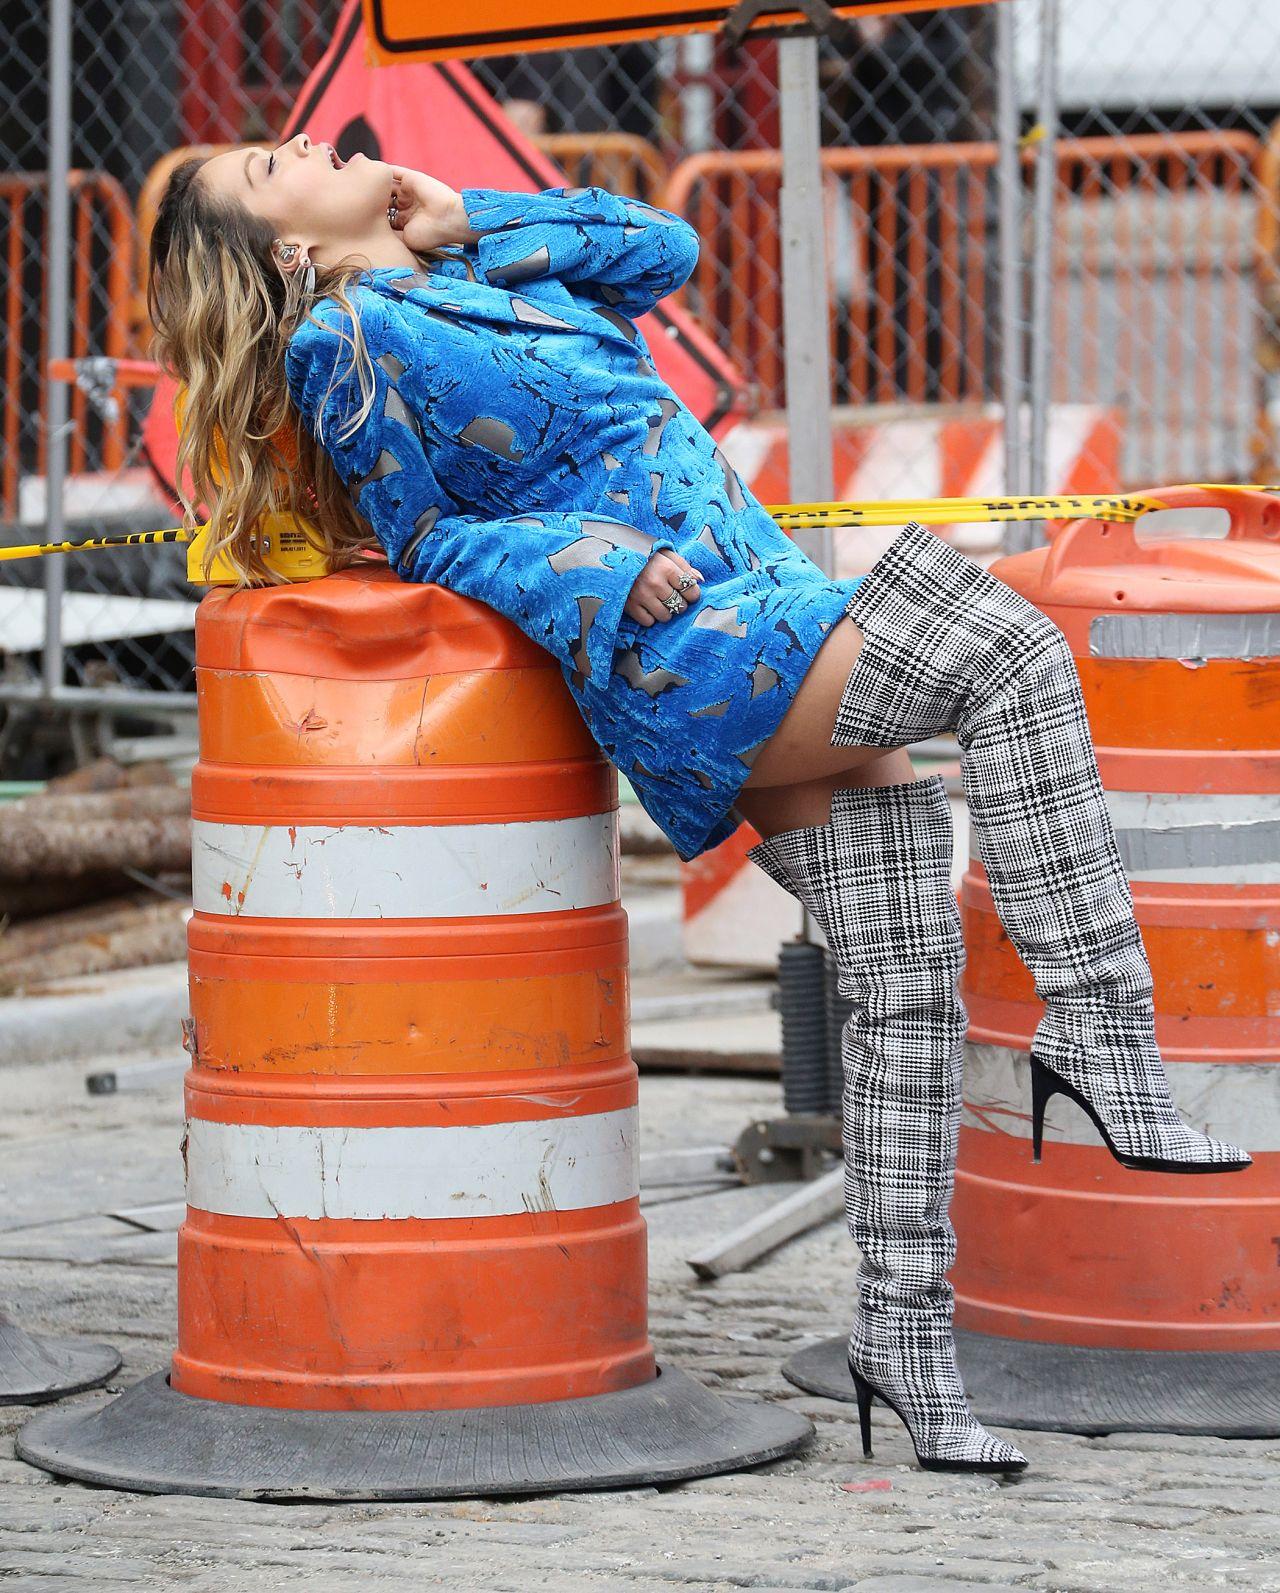 rita-ora-filming-a-music-video-in-new-york-city-10-05-2017-17.jpg